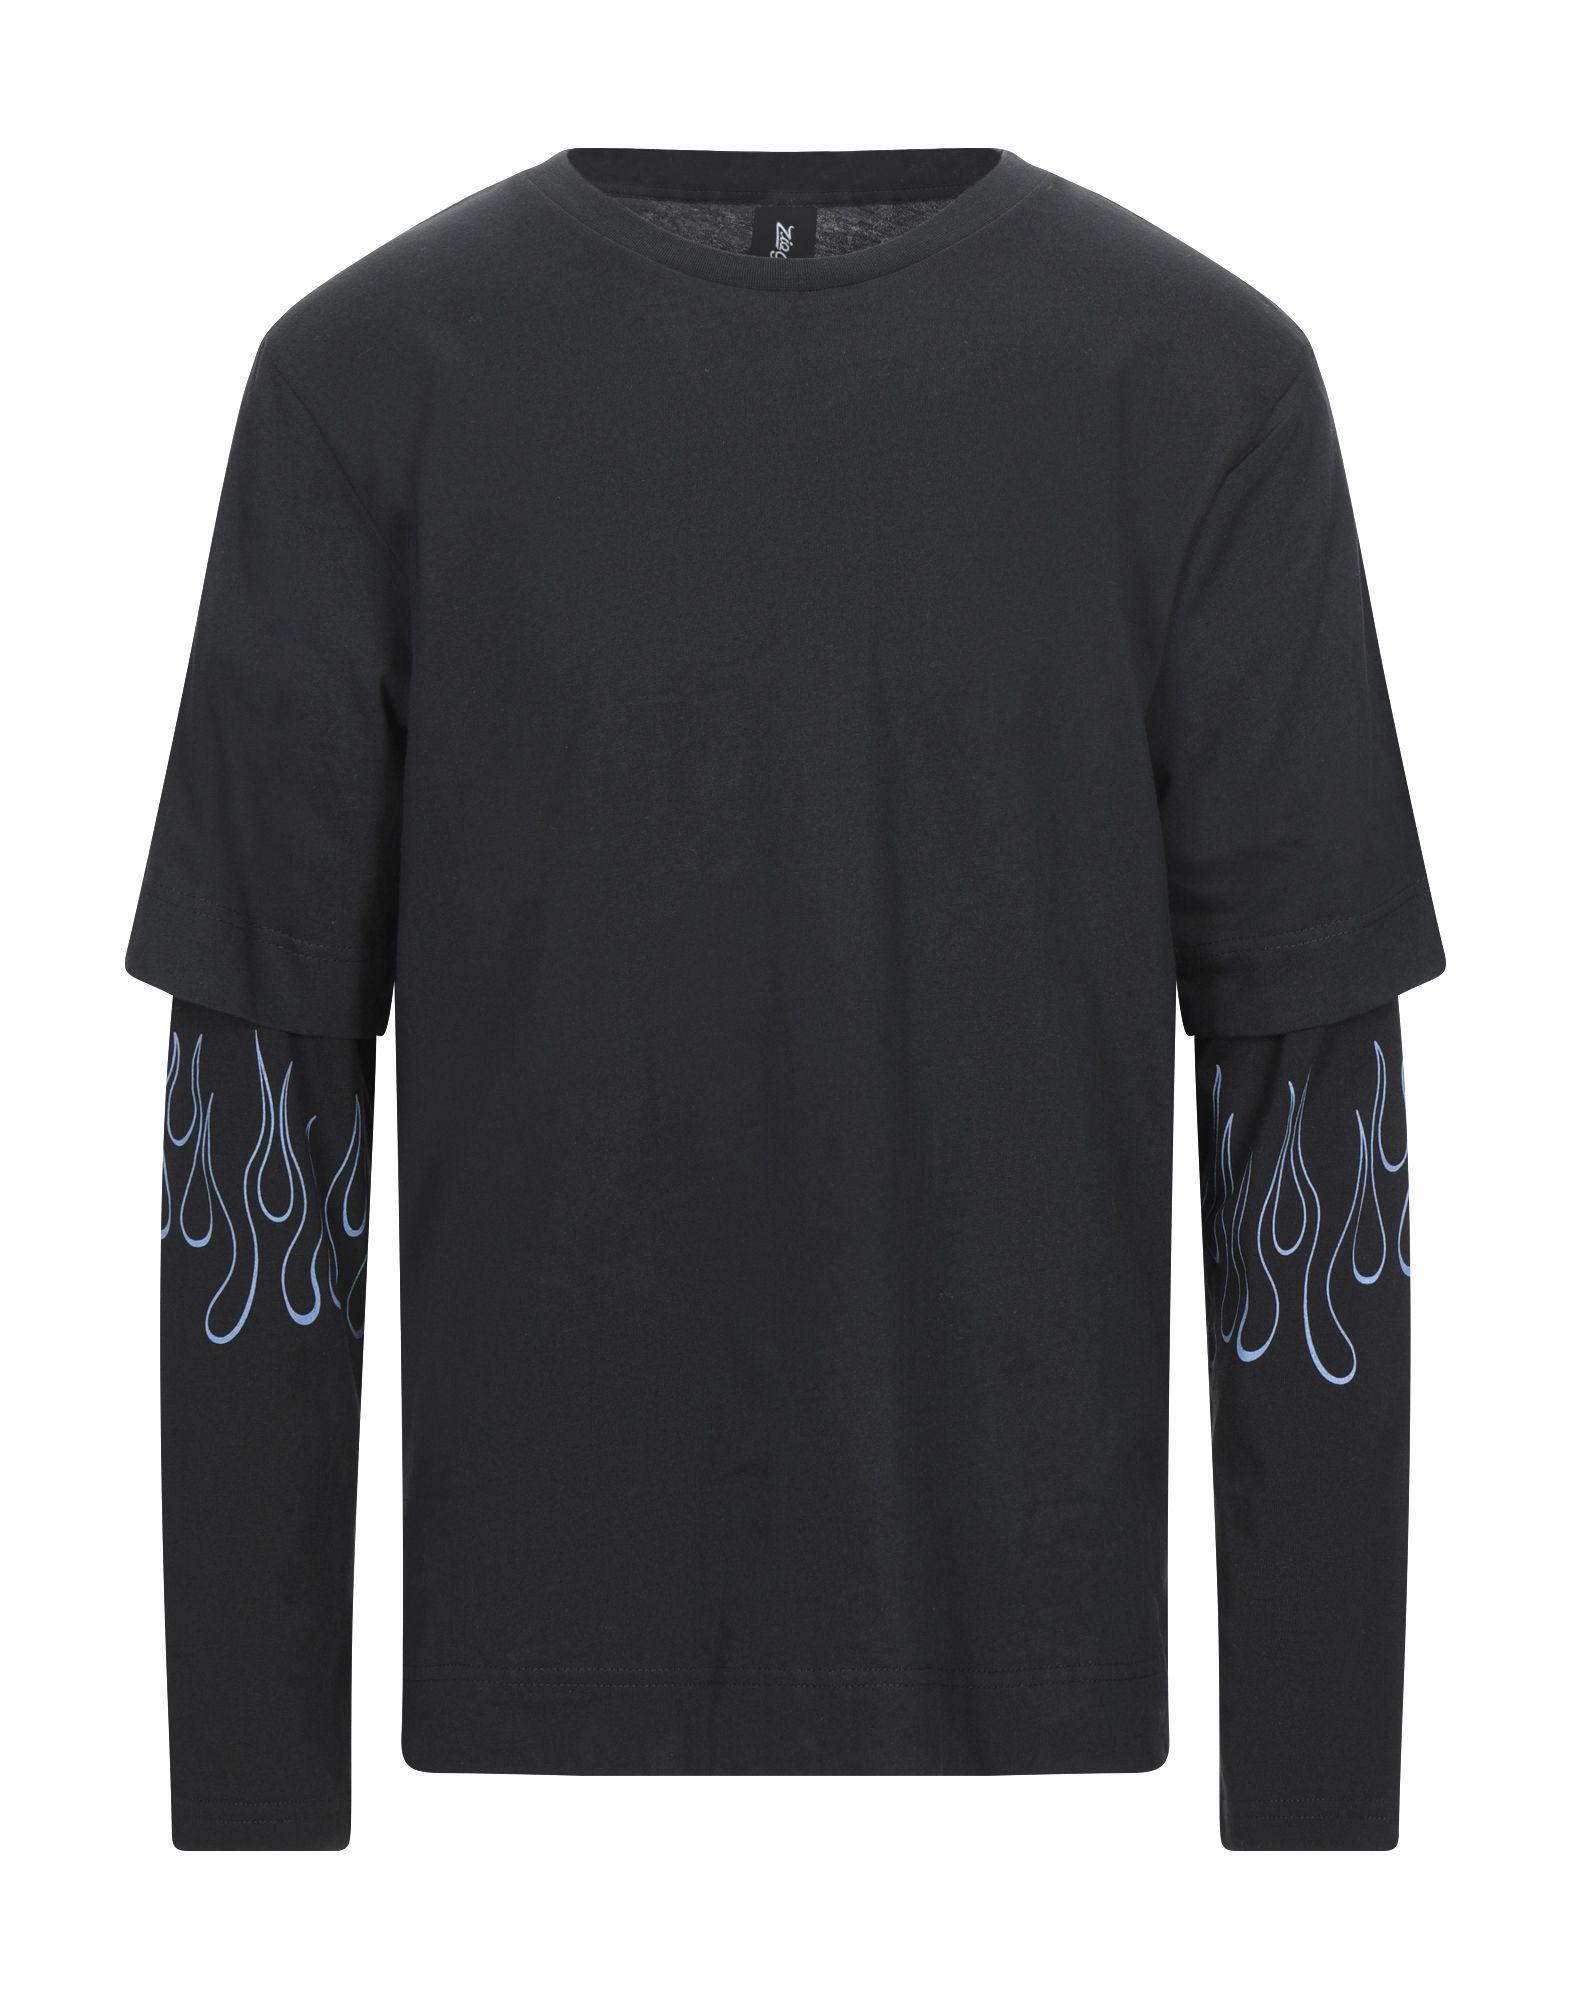 футболка ziq ZIQ & YONI - ZNY Футболка